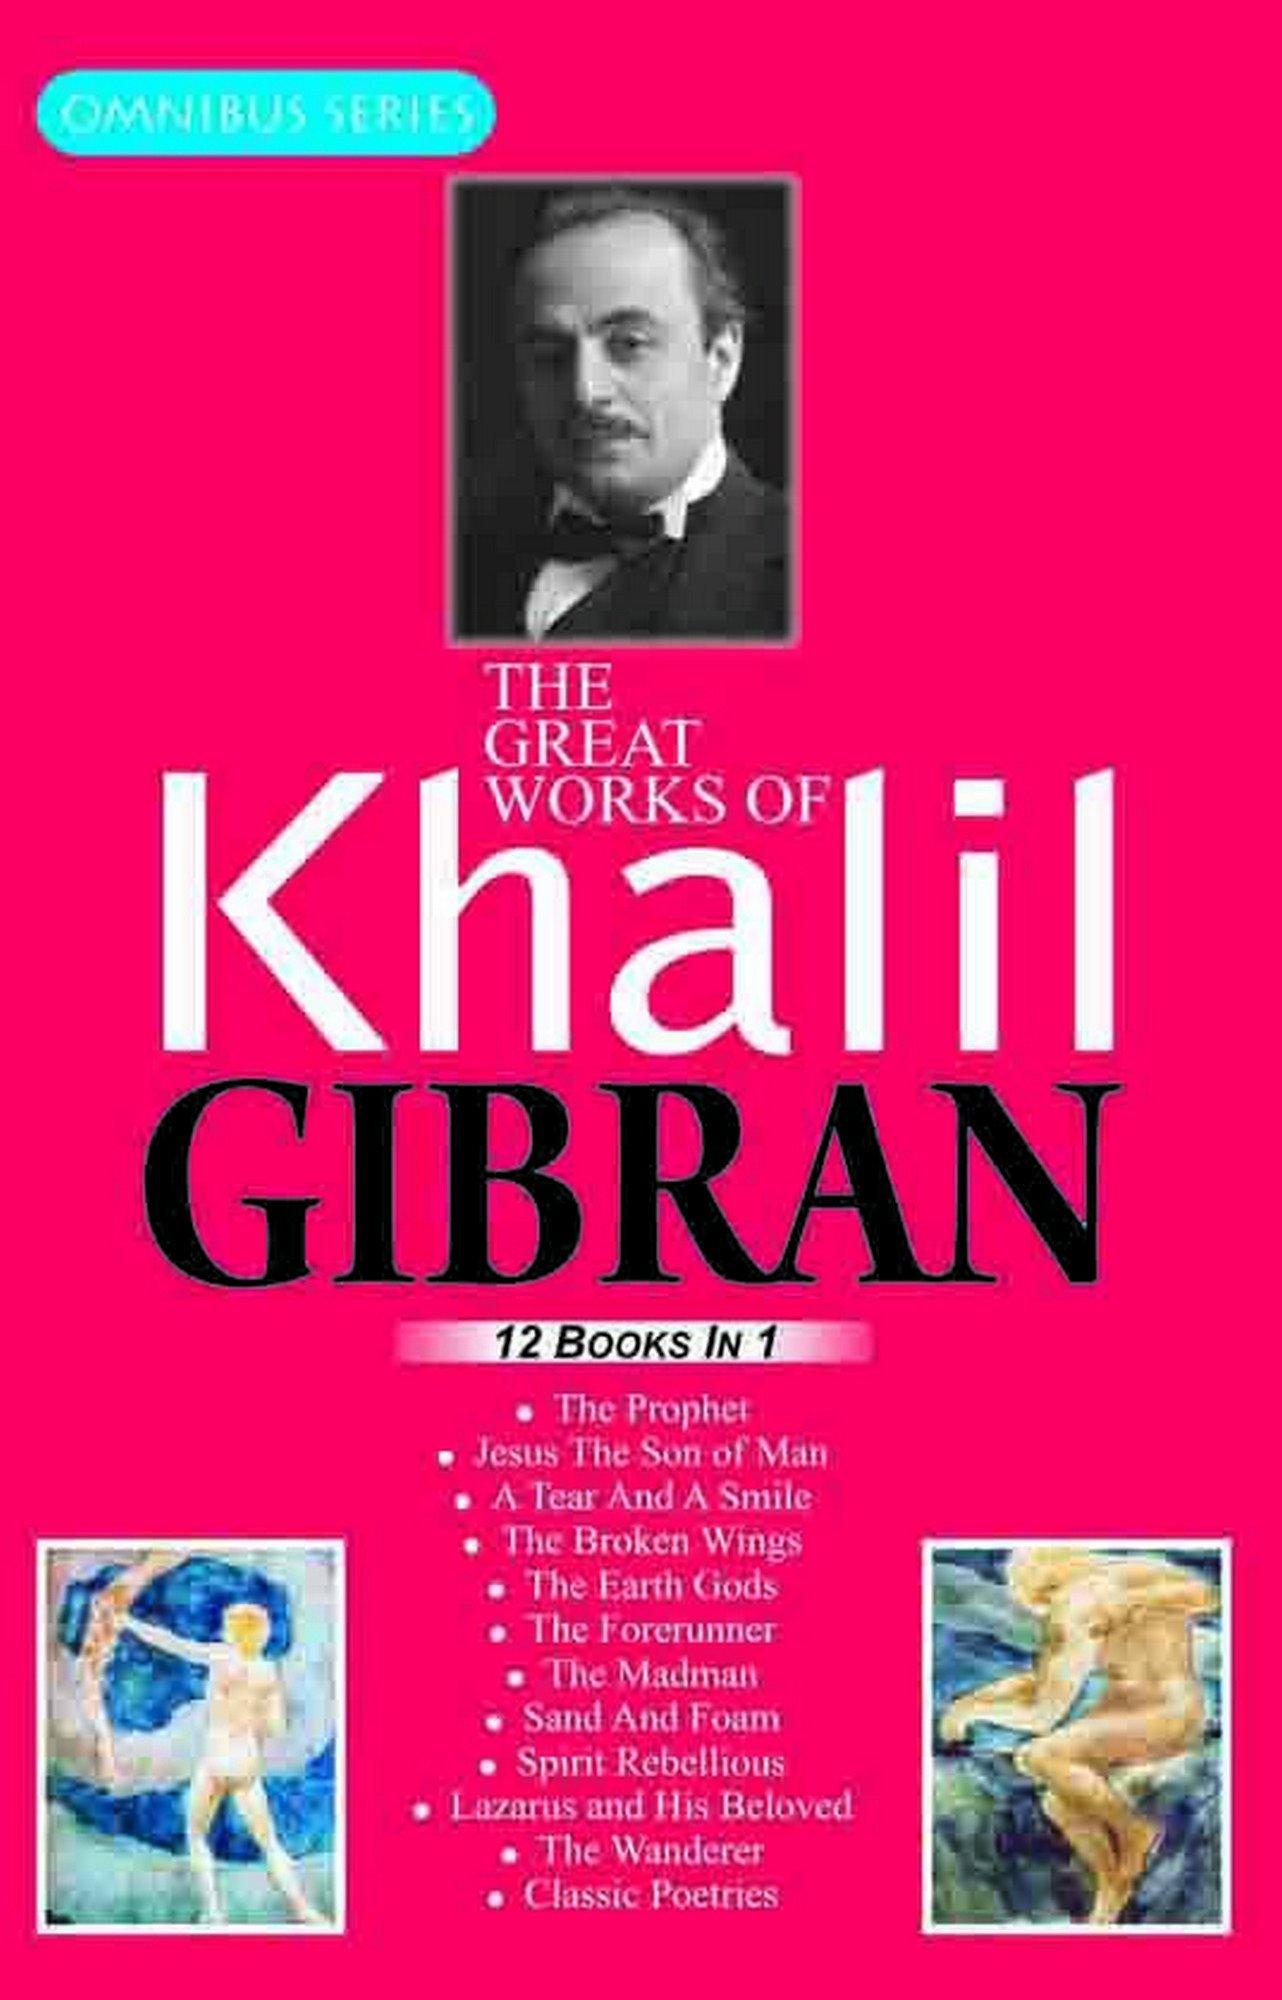 Omnibus Series : The Great Works of Khalil Gibran